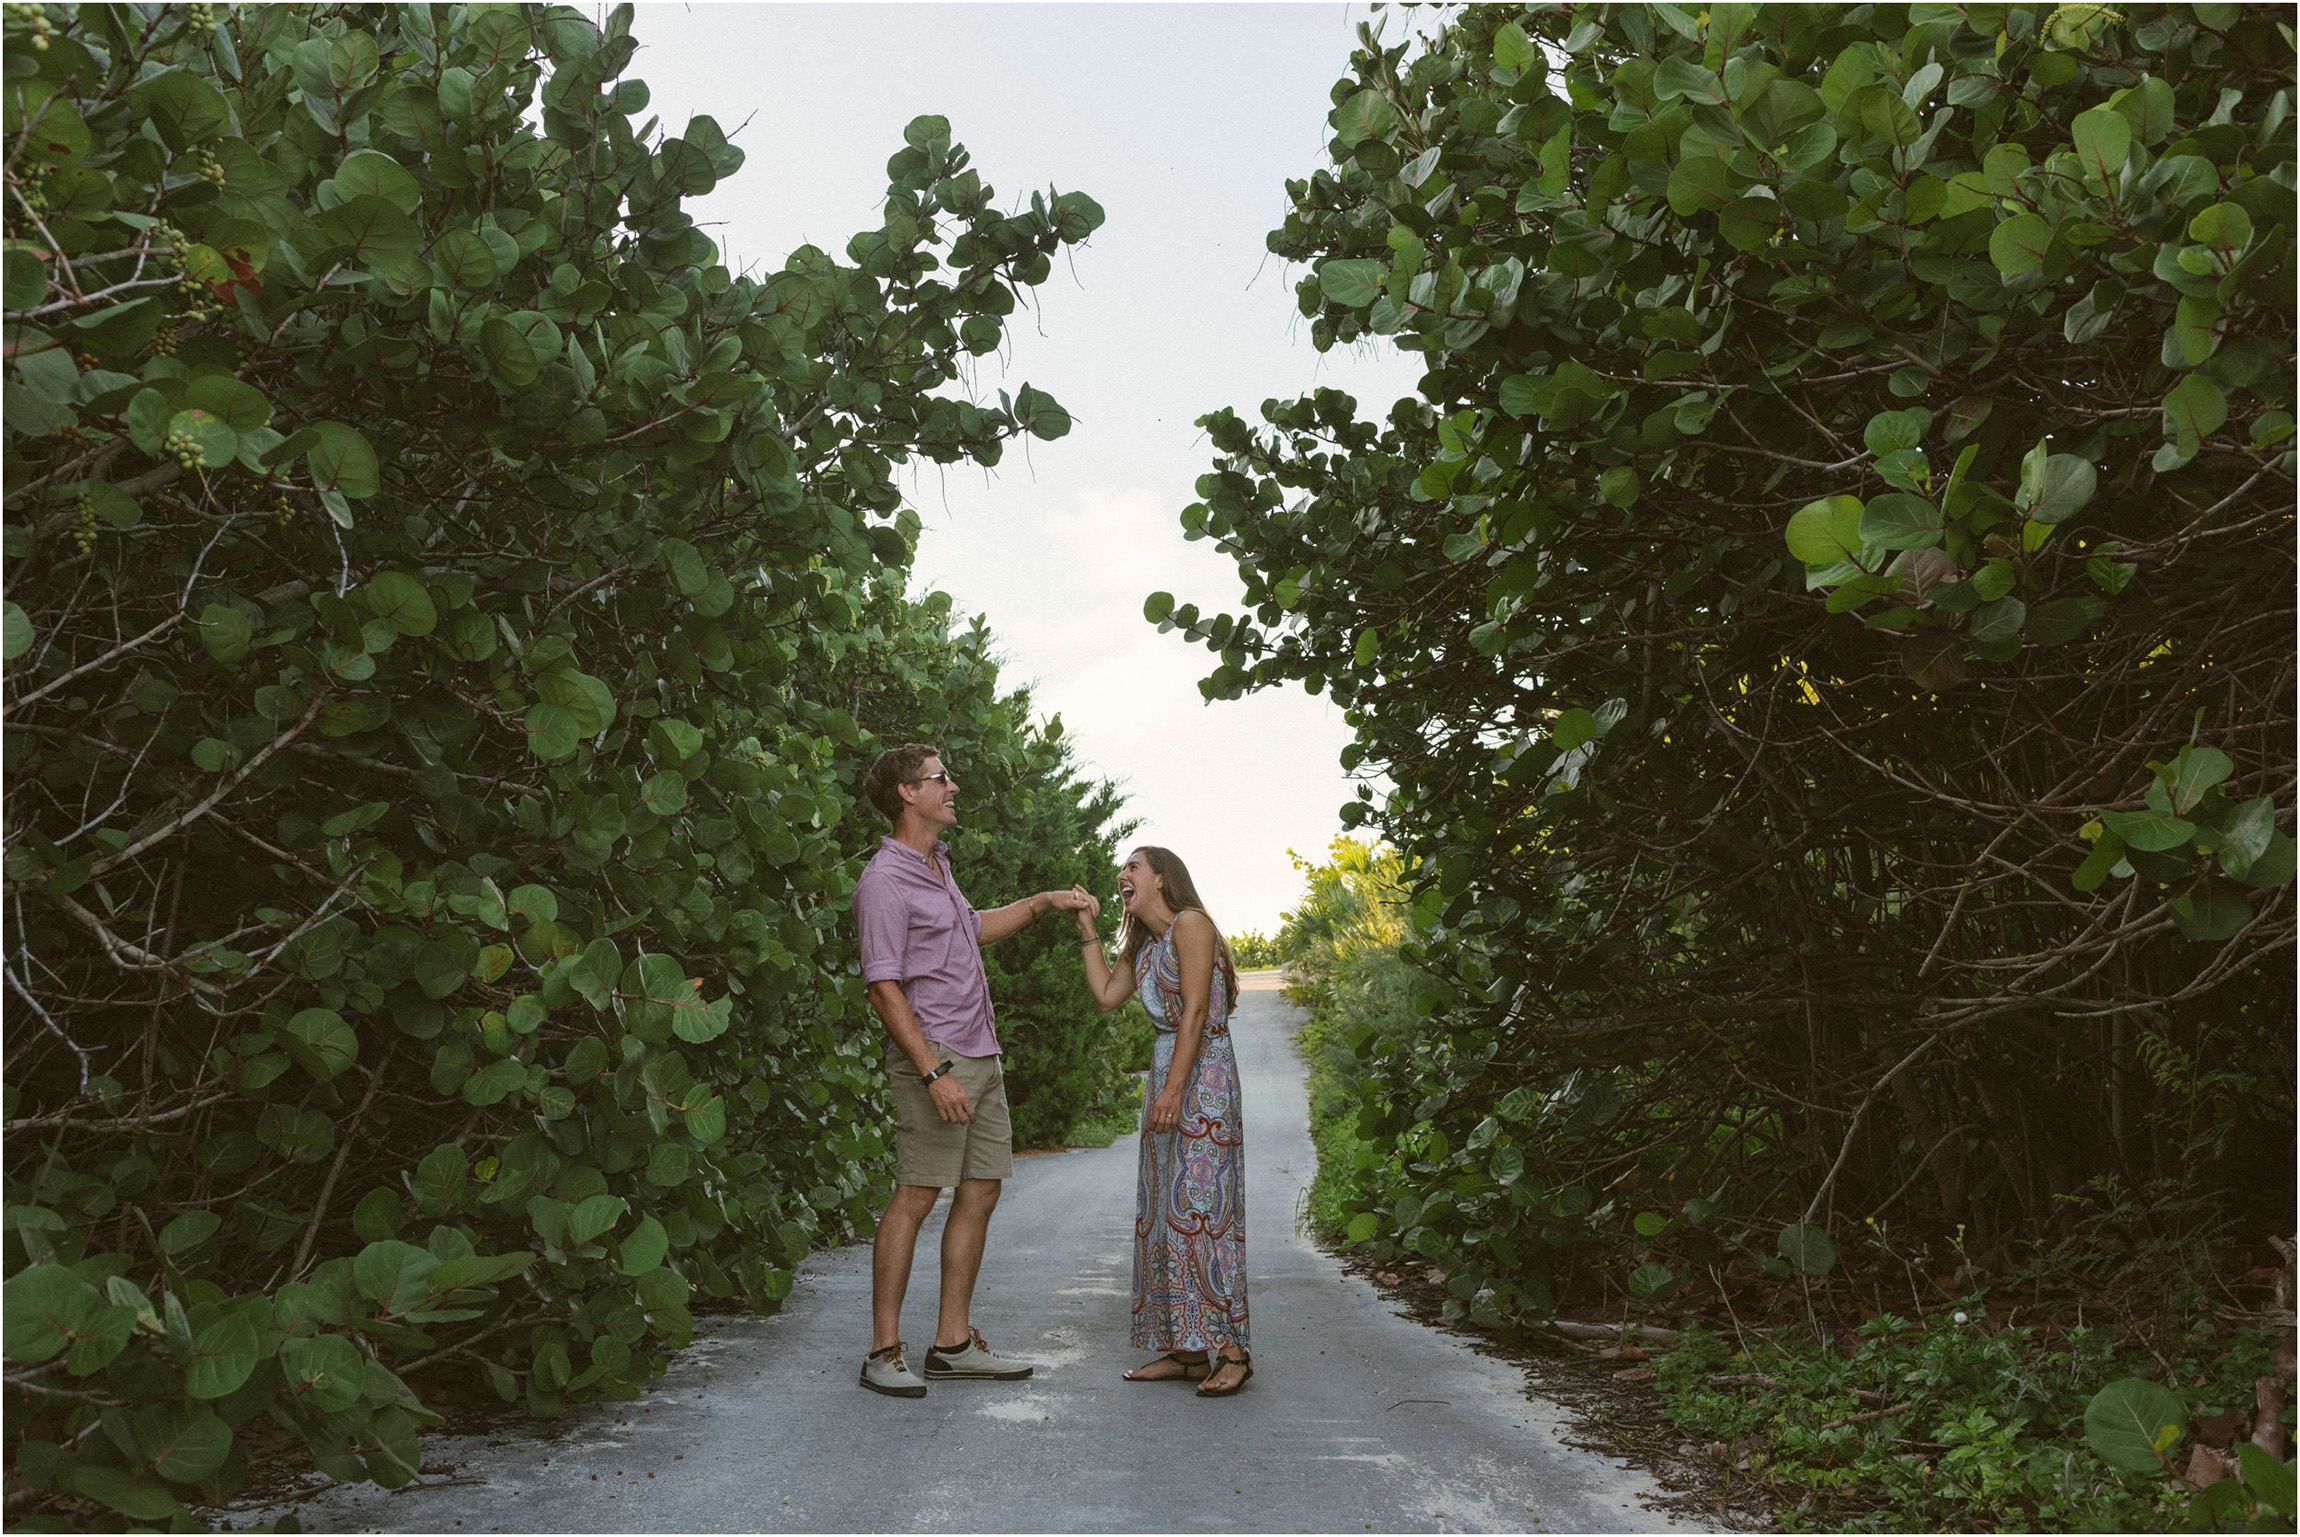 ©FianderFoto_Bermuda Engagement Photographer_Coopers Island_006.jpg